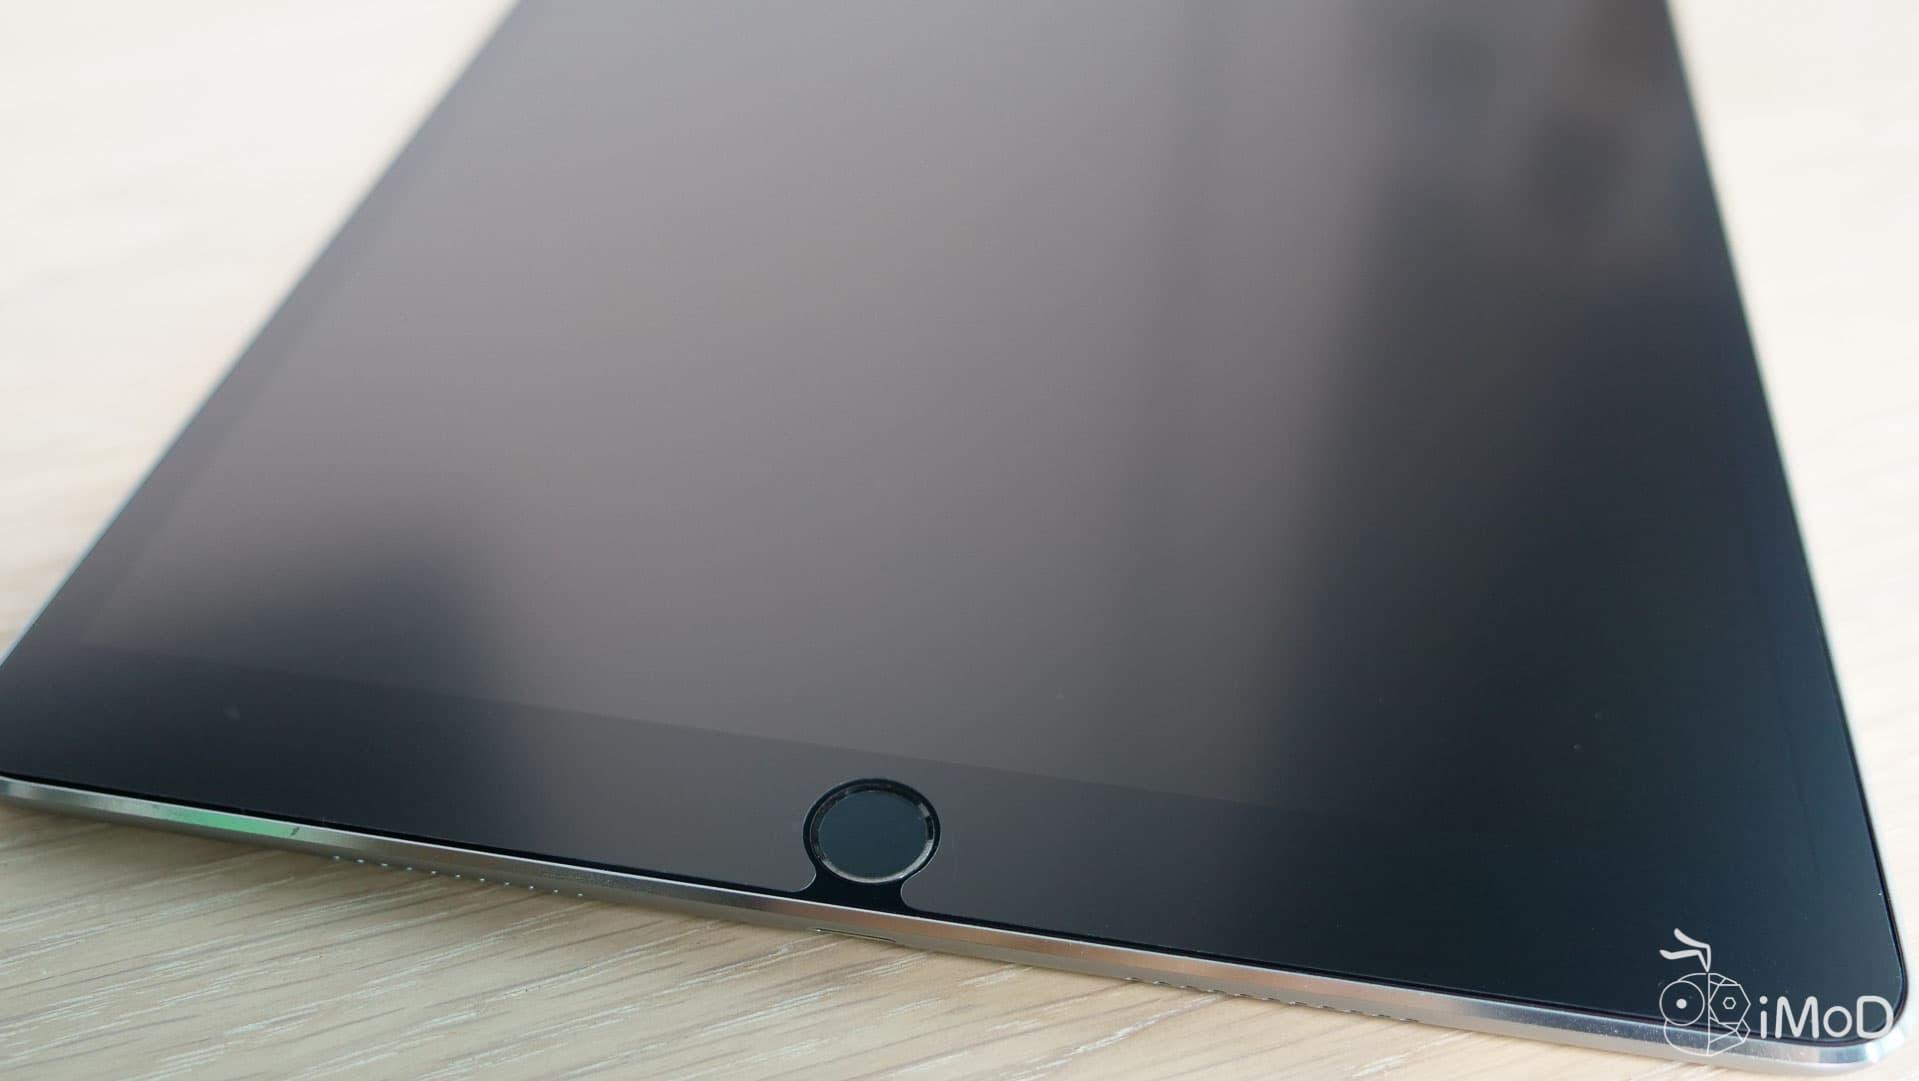 Focus Ipad Pro 10.5 Smart Note 2549